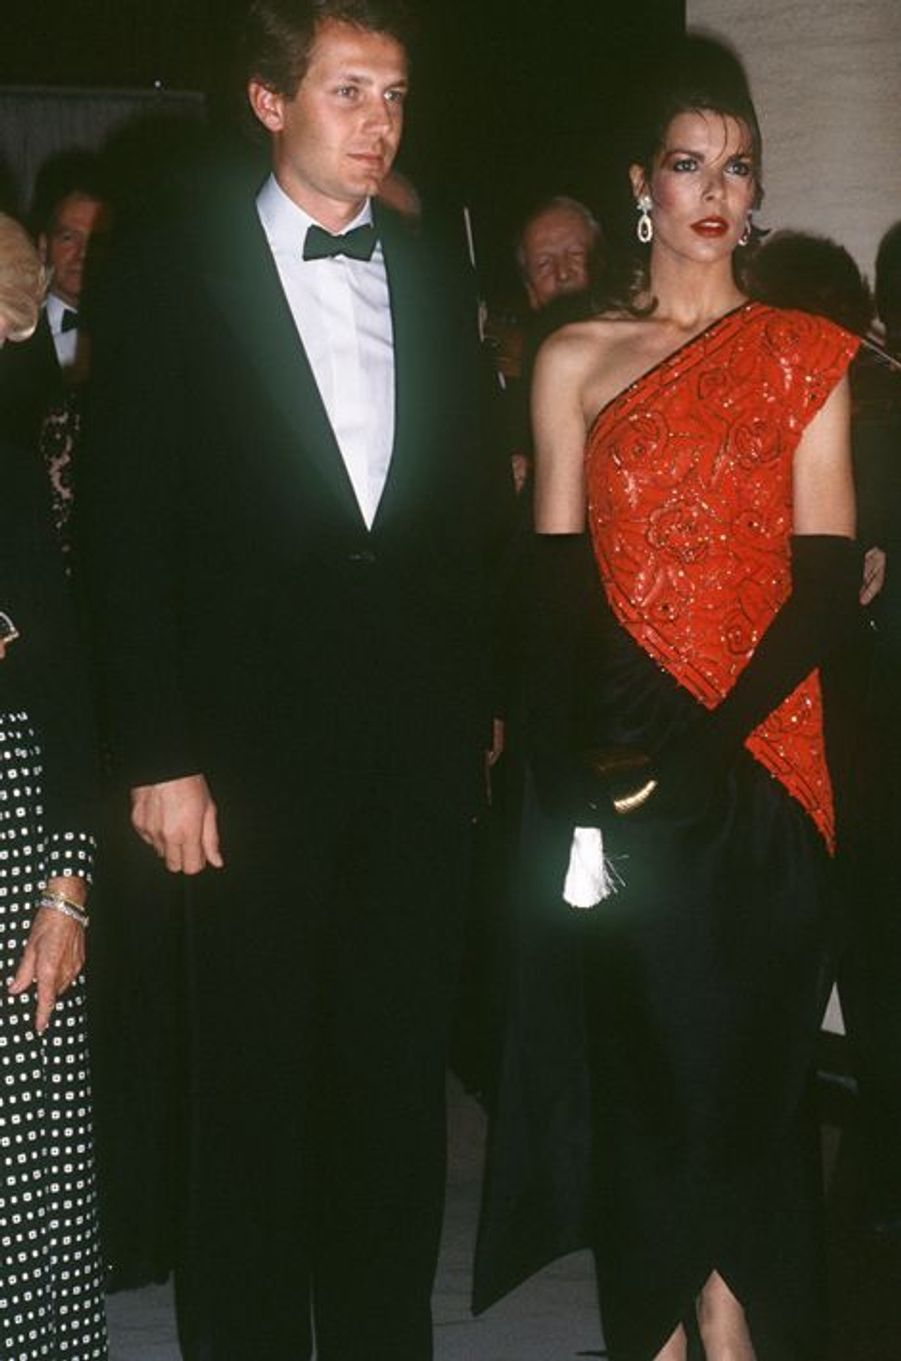 La princesse Caroline de Monaco au bal de la Rose 1985, avec Stefano Casiraghi